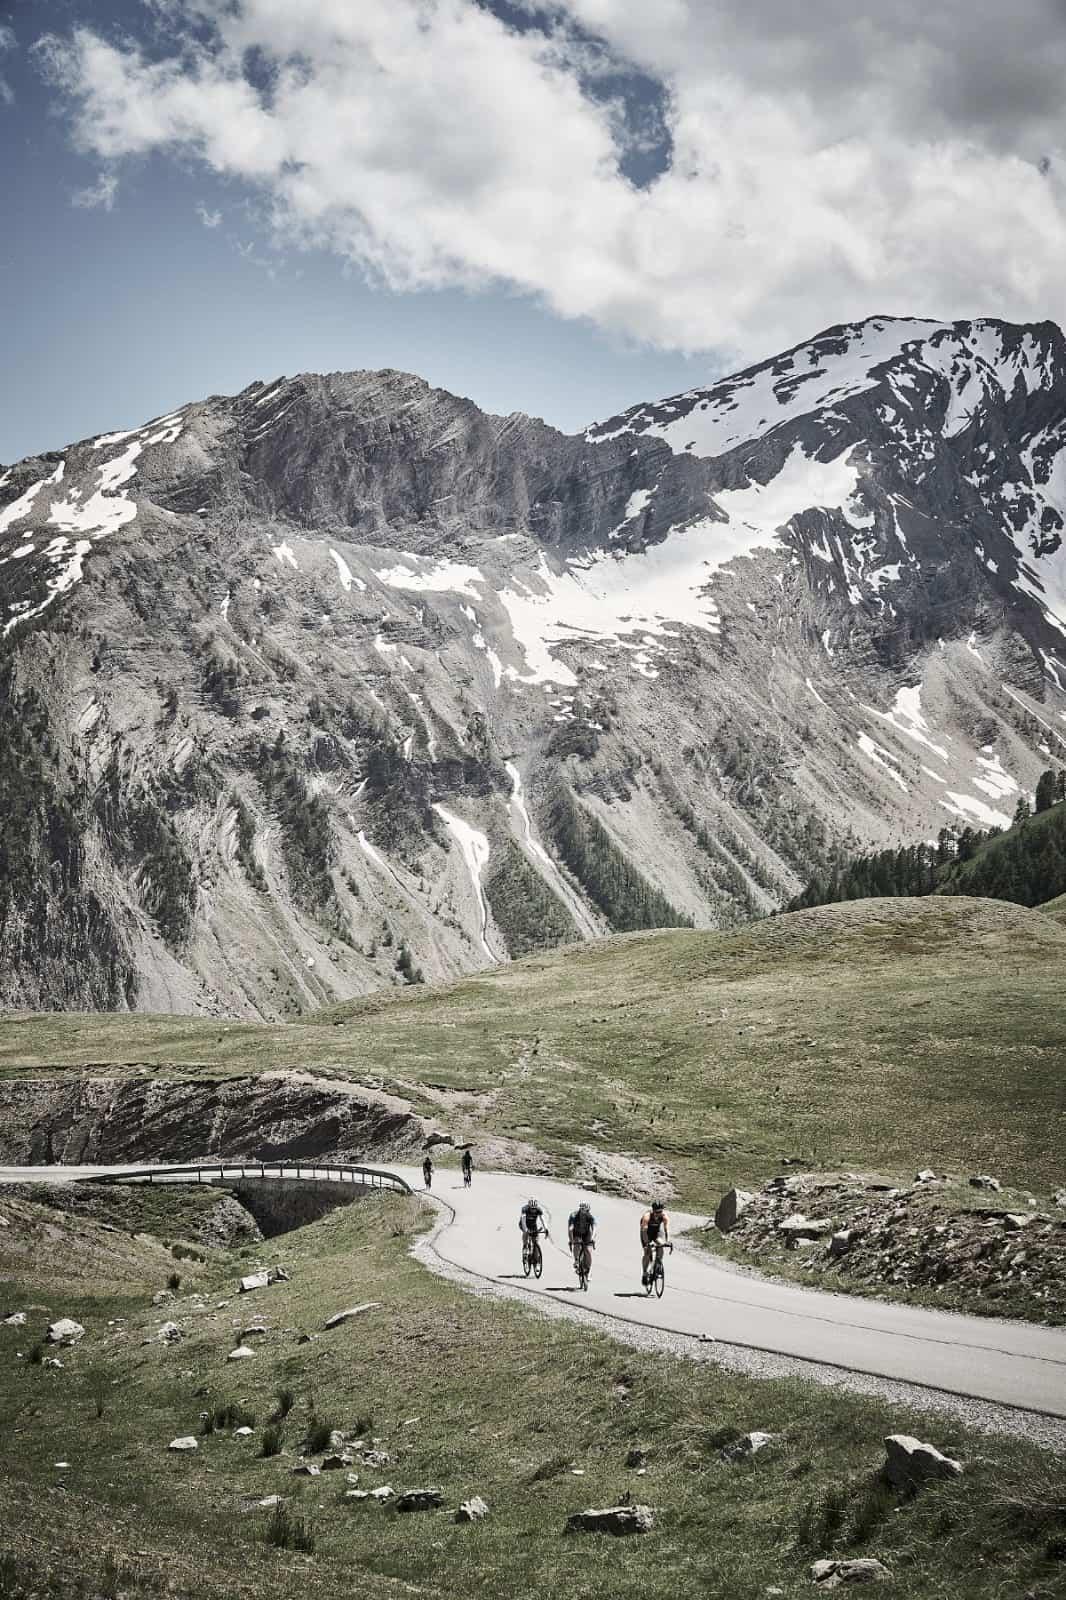 Cykelnerven challenge route